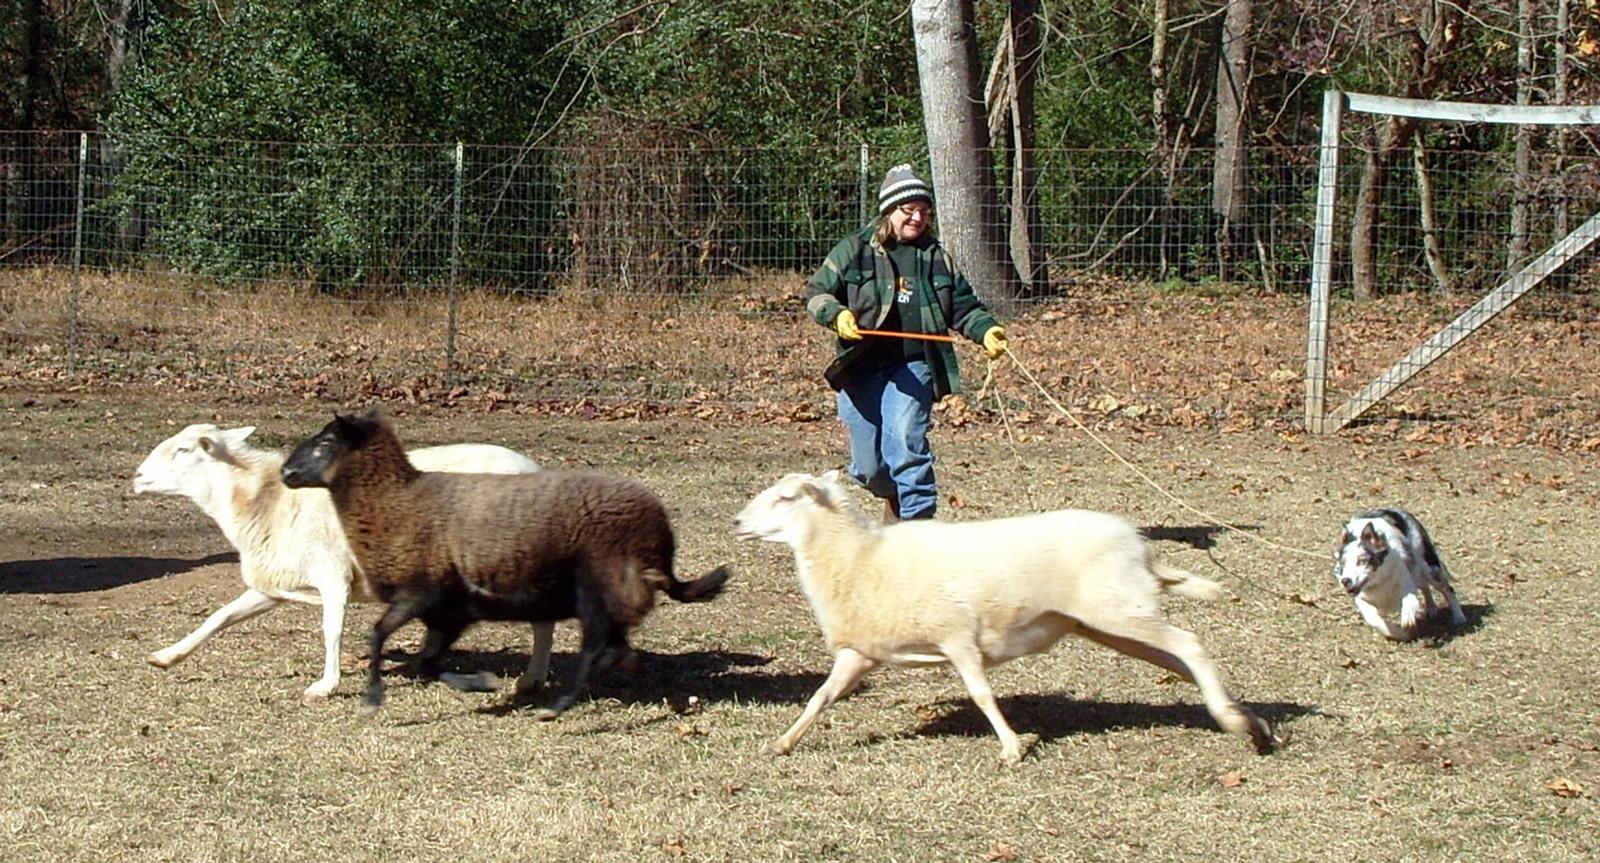 Dogs Herding Sheep Video